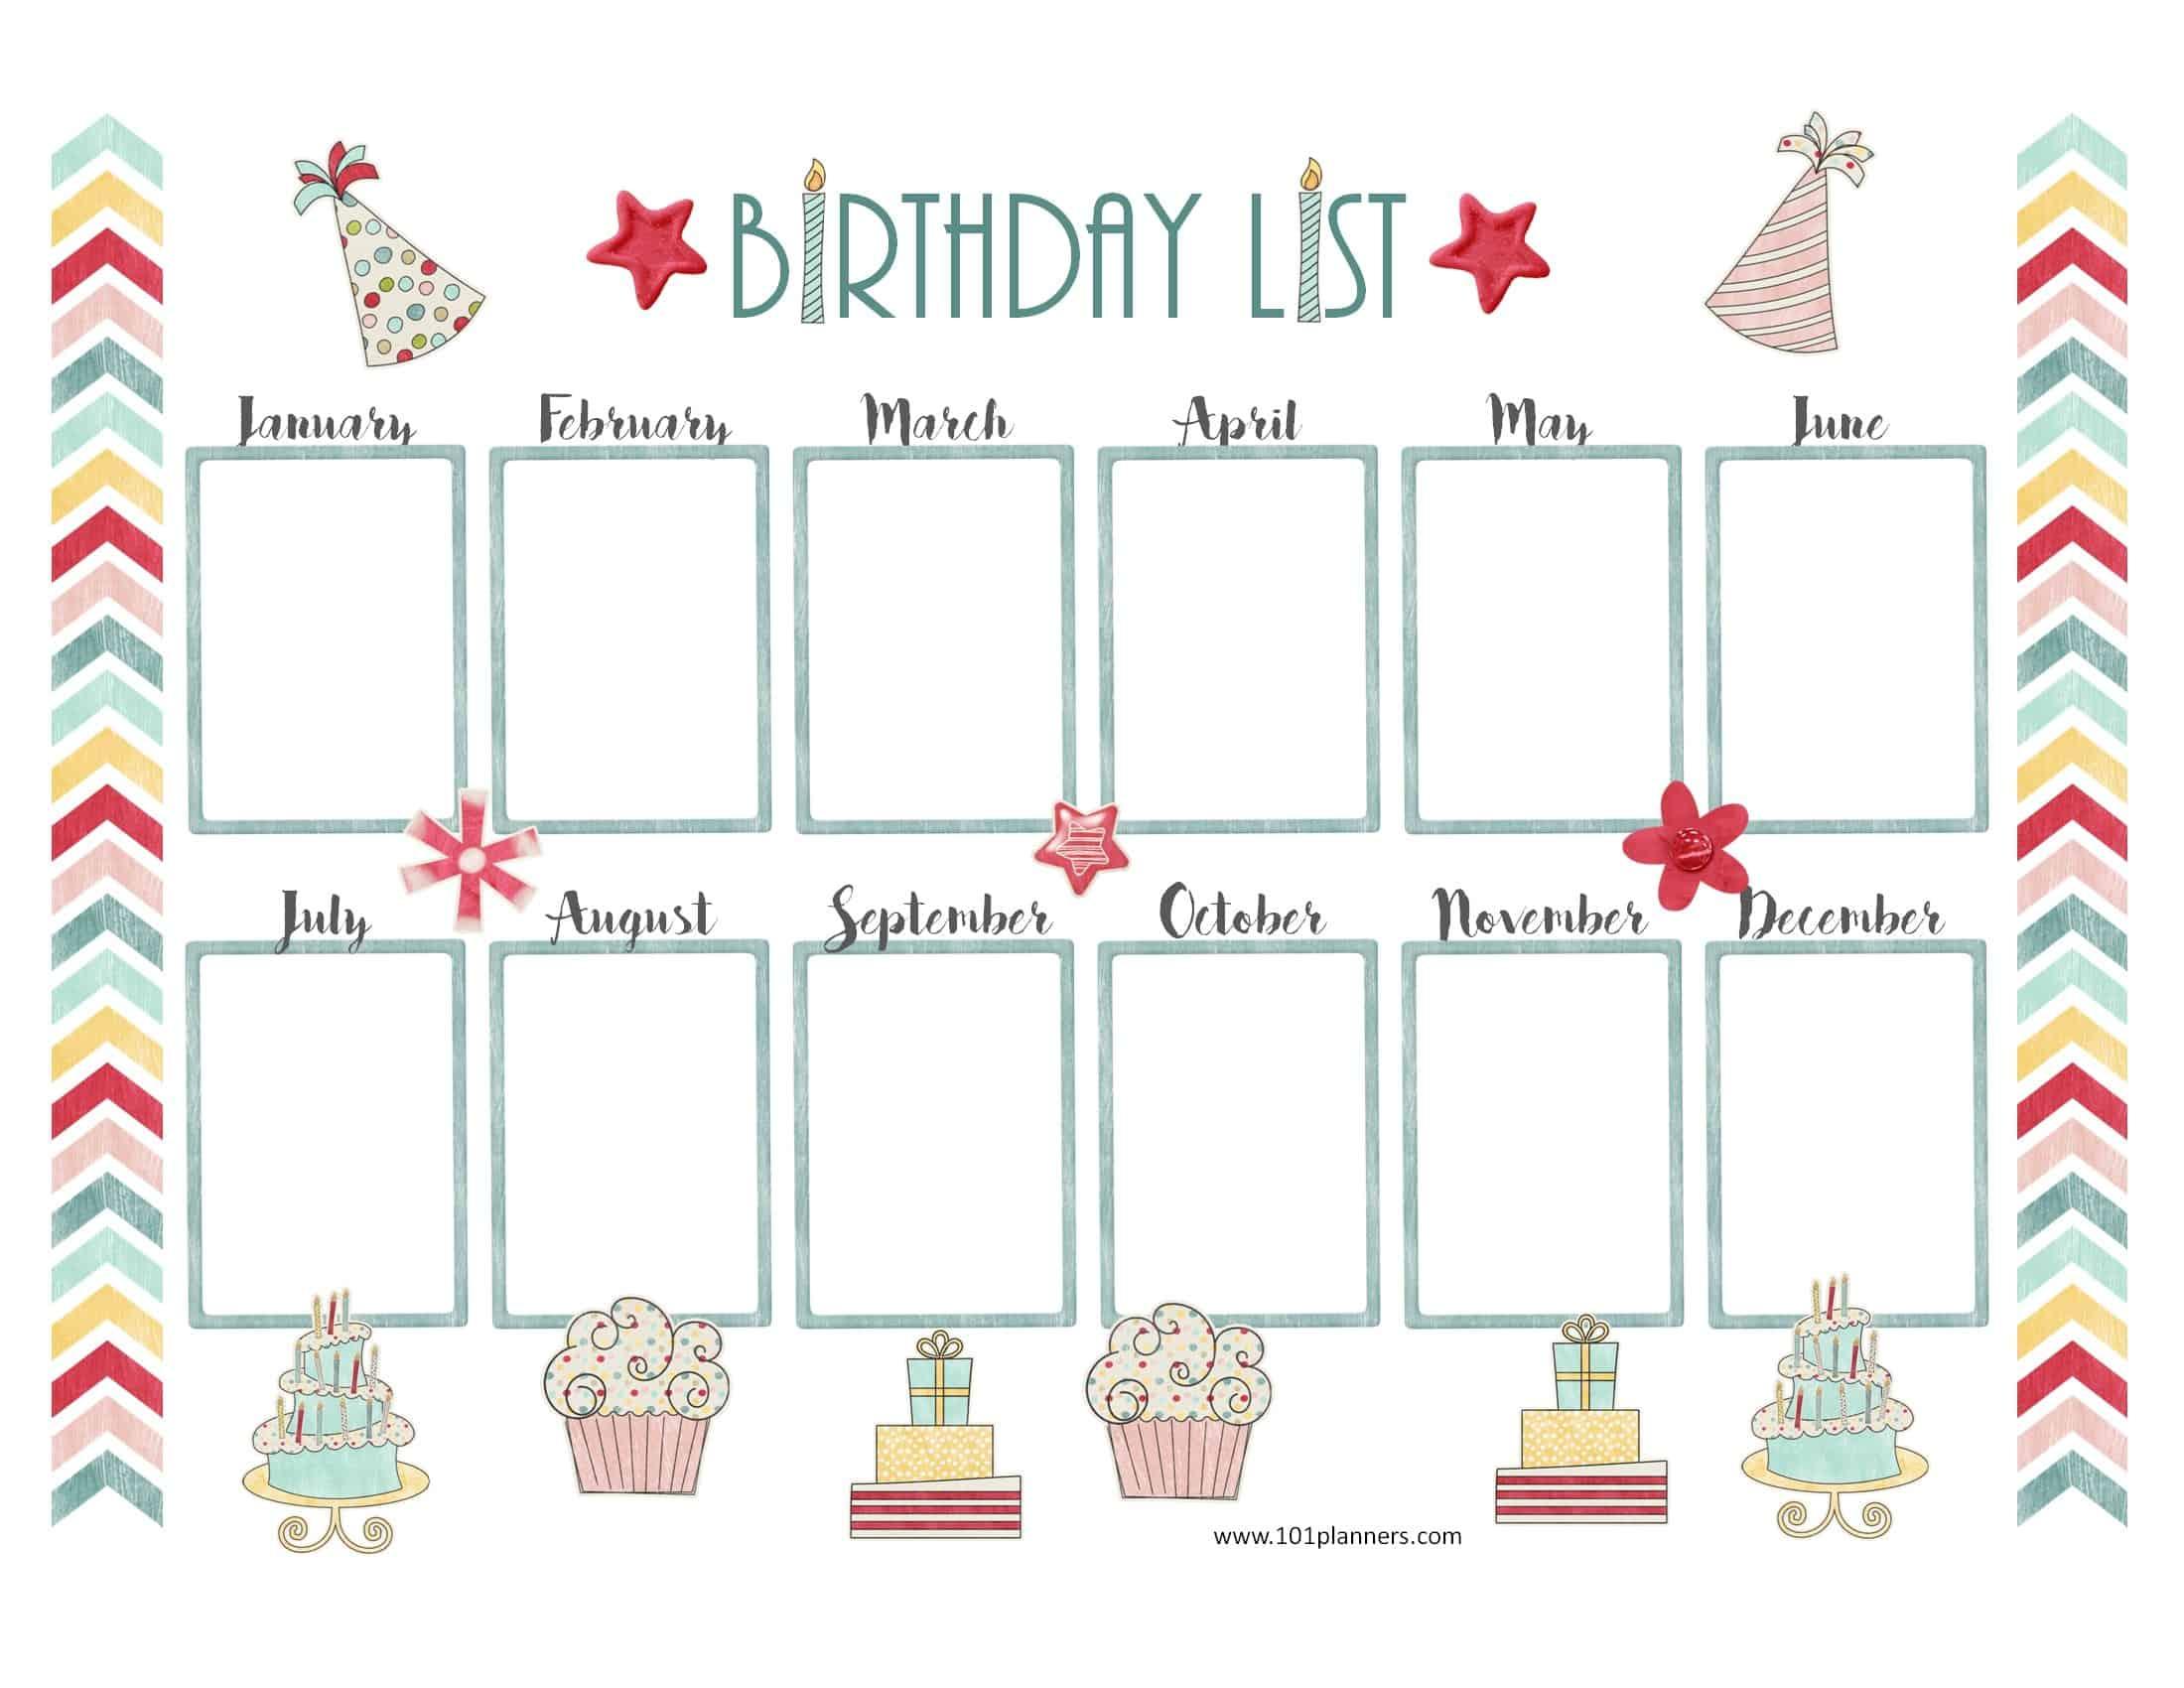 Free Birthday Calendar | Printable & Customizable | Many Designs! with Free Printable Birthday Calendar Template